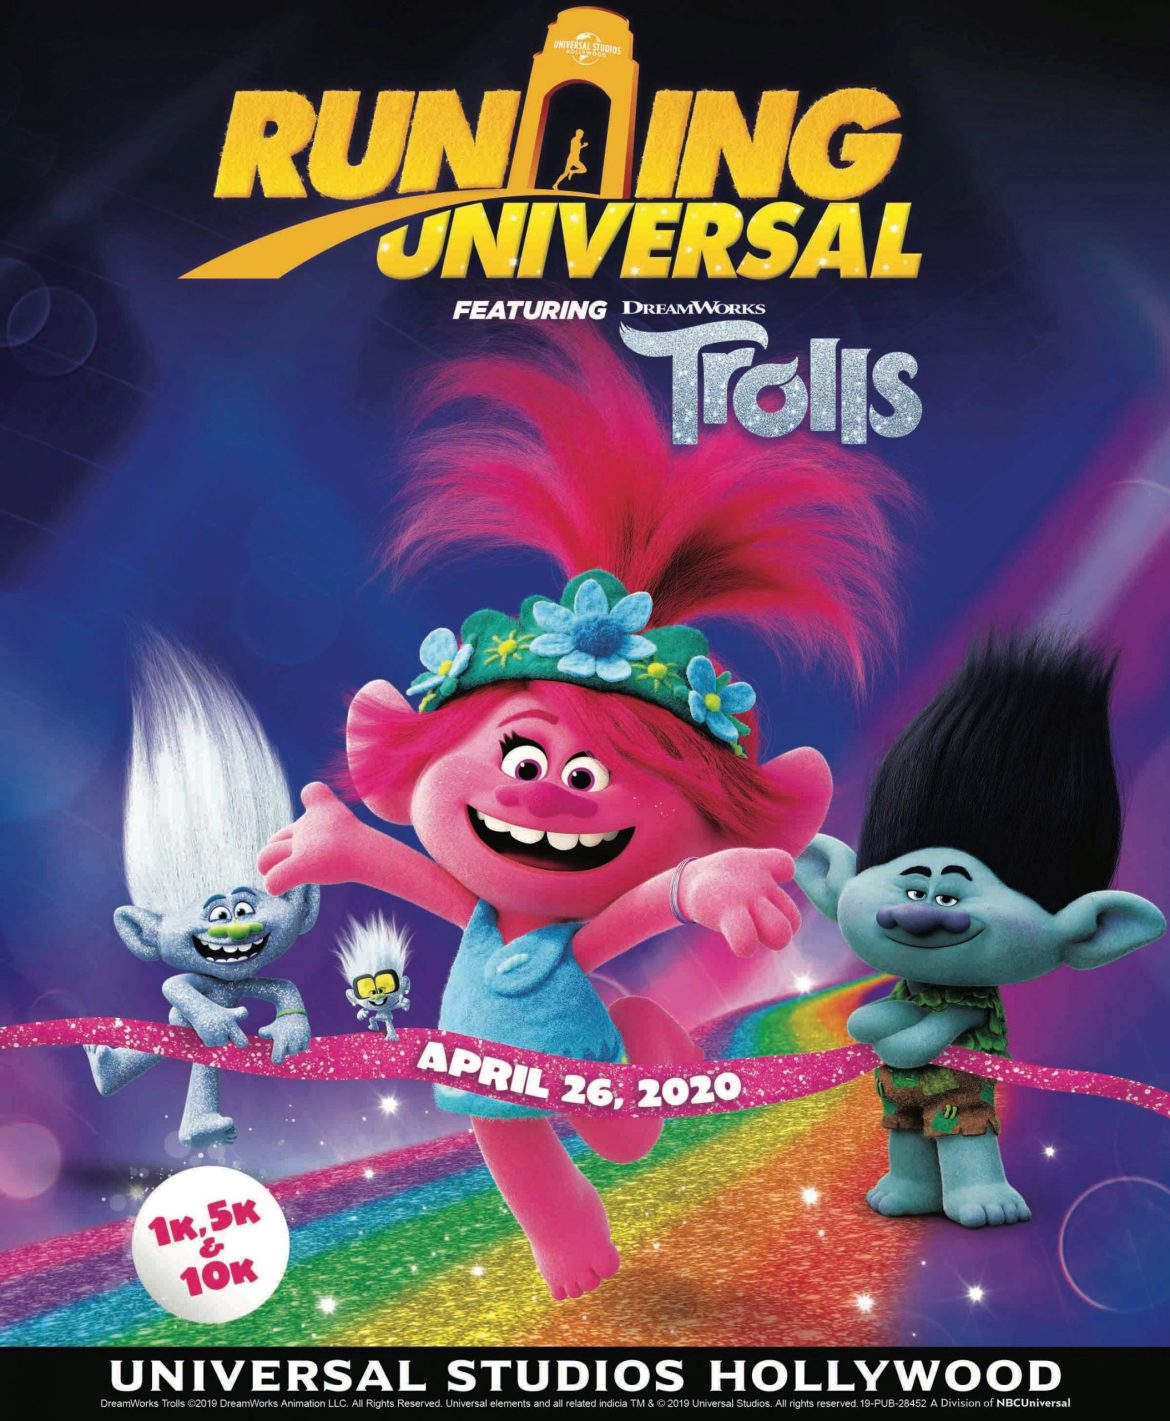 Running Universal Will Feature Dreamworks' Trolls